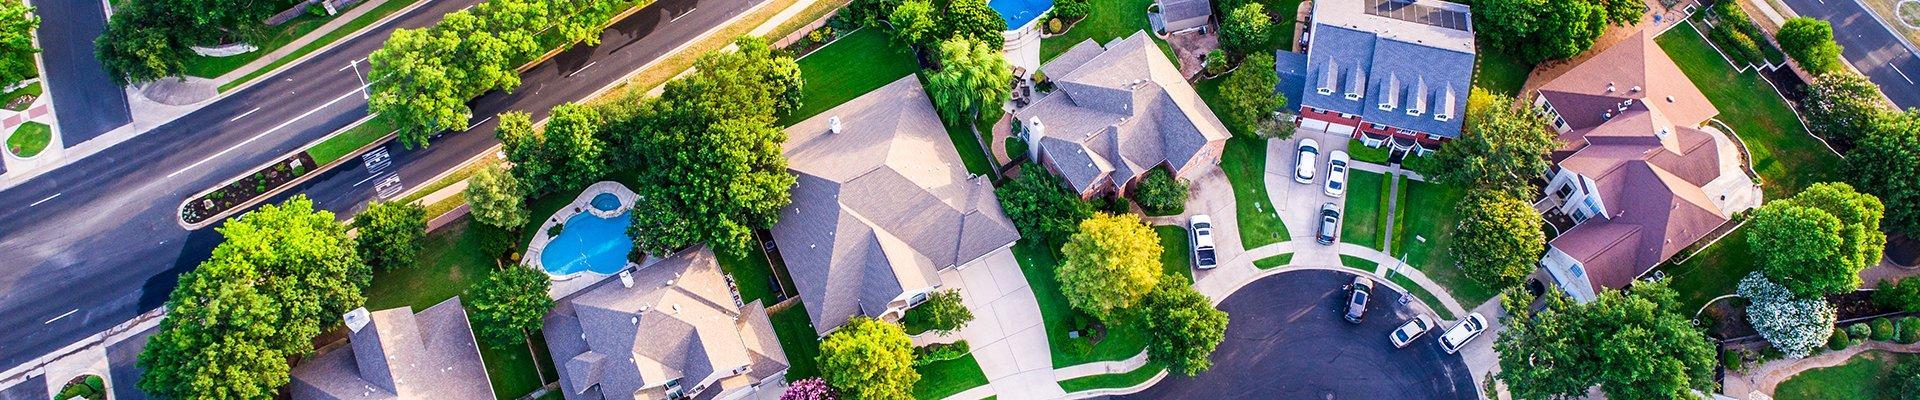 a row of homes in a suburban neighborhood in lake dallas texas